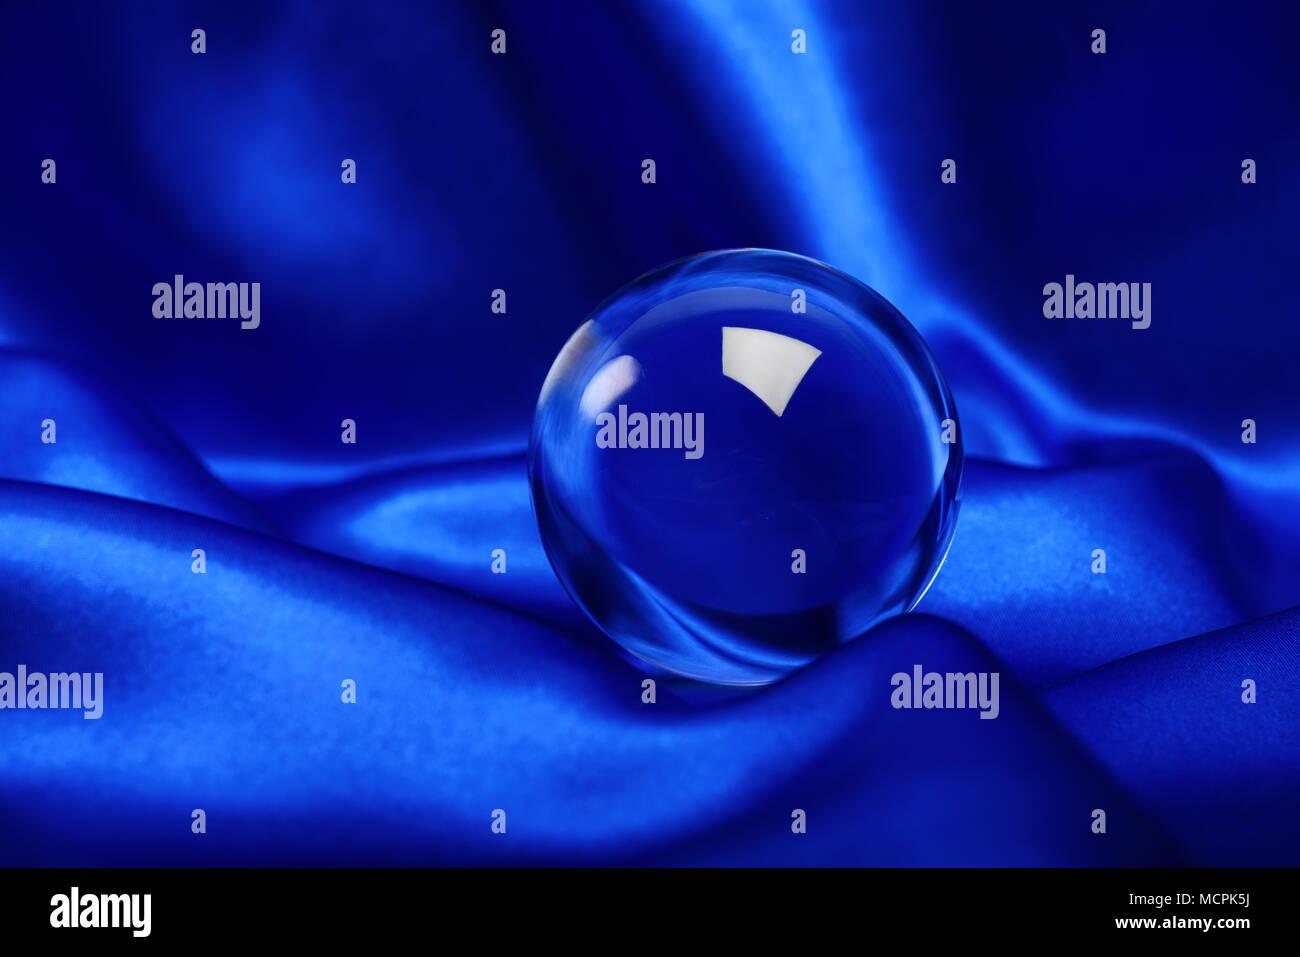 Leuchtender Kristall Kugel Schuß auf blaue Leinwand Stockbild